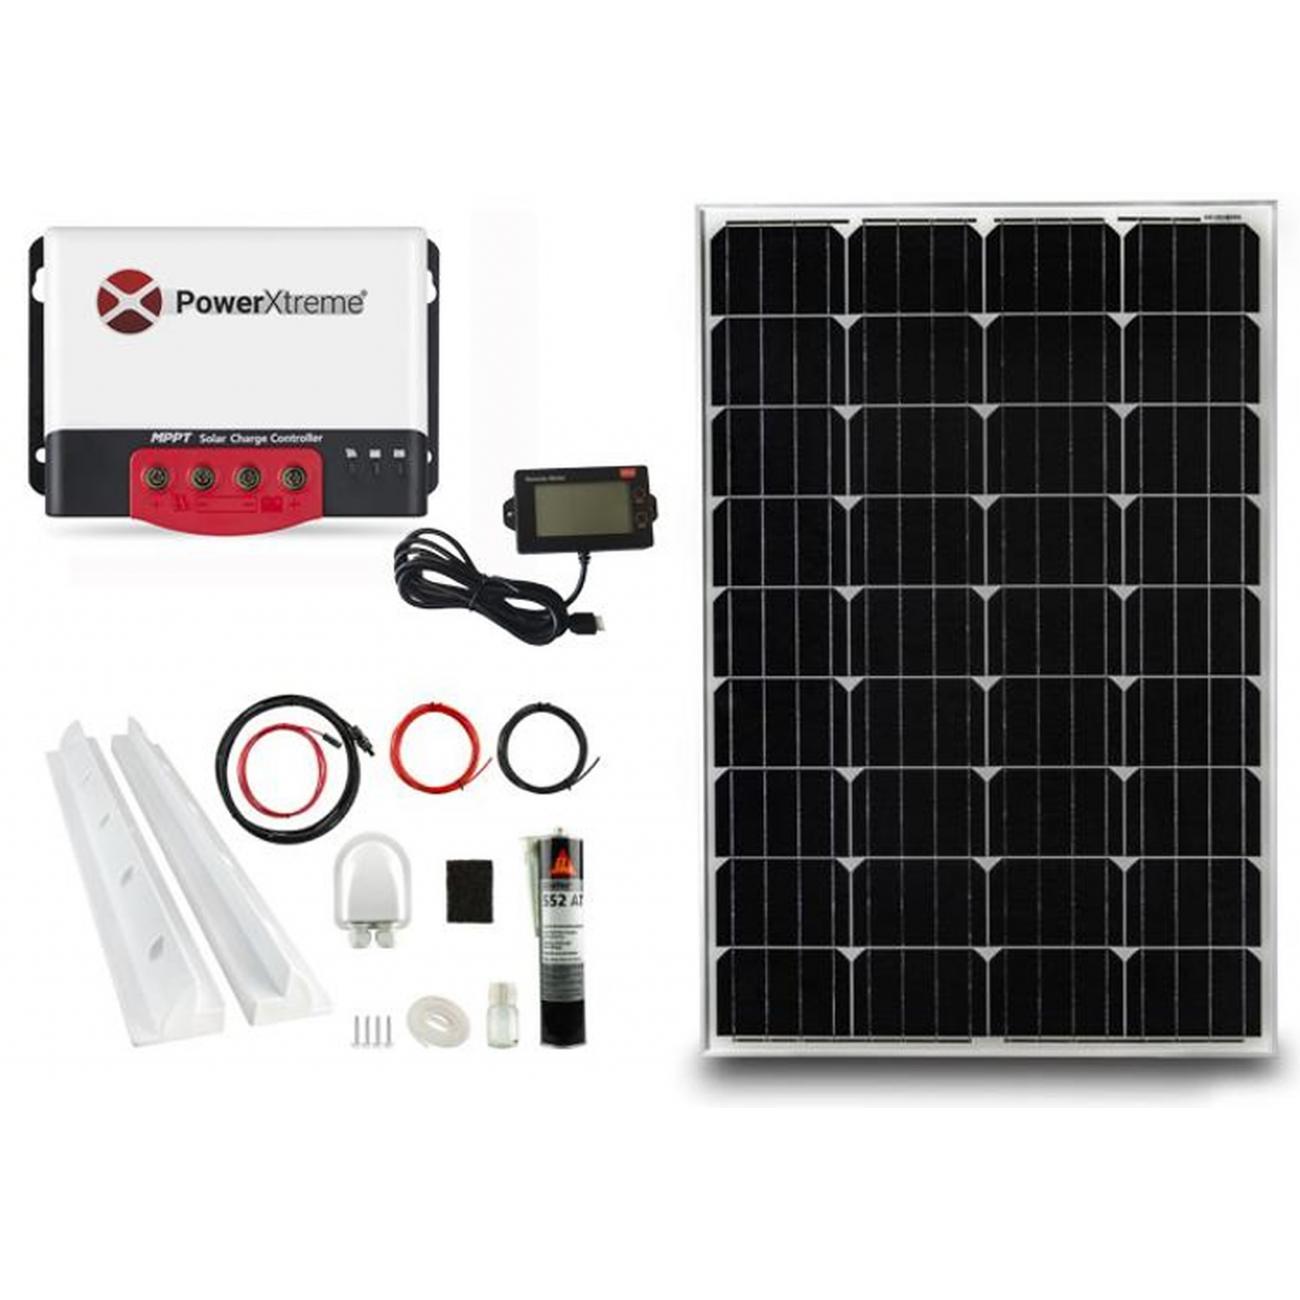 MPPT Solar Laderegler PowerXtreme XS20s Mit Display 100W Paket